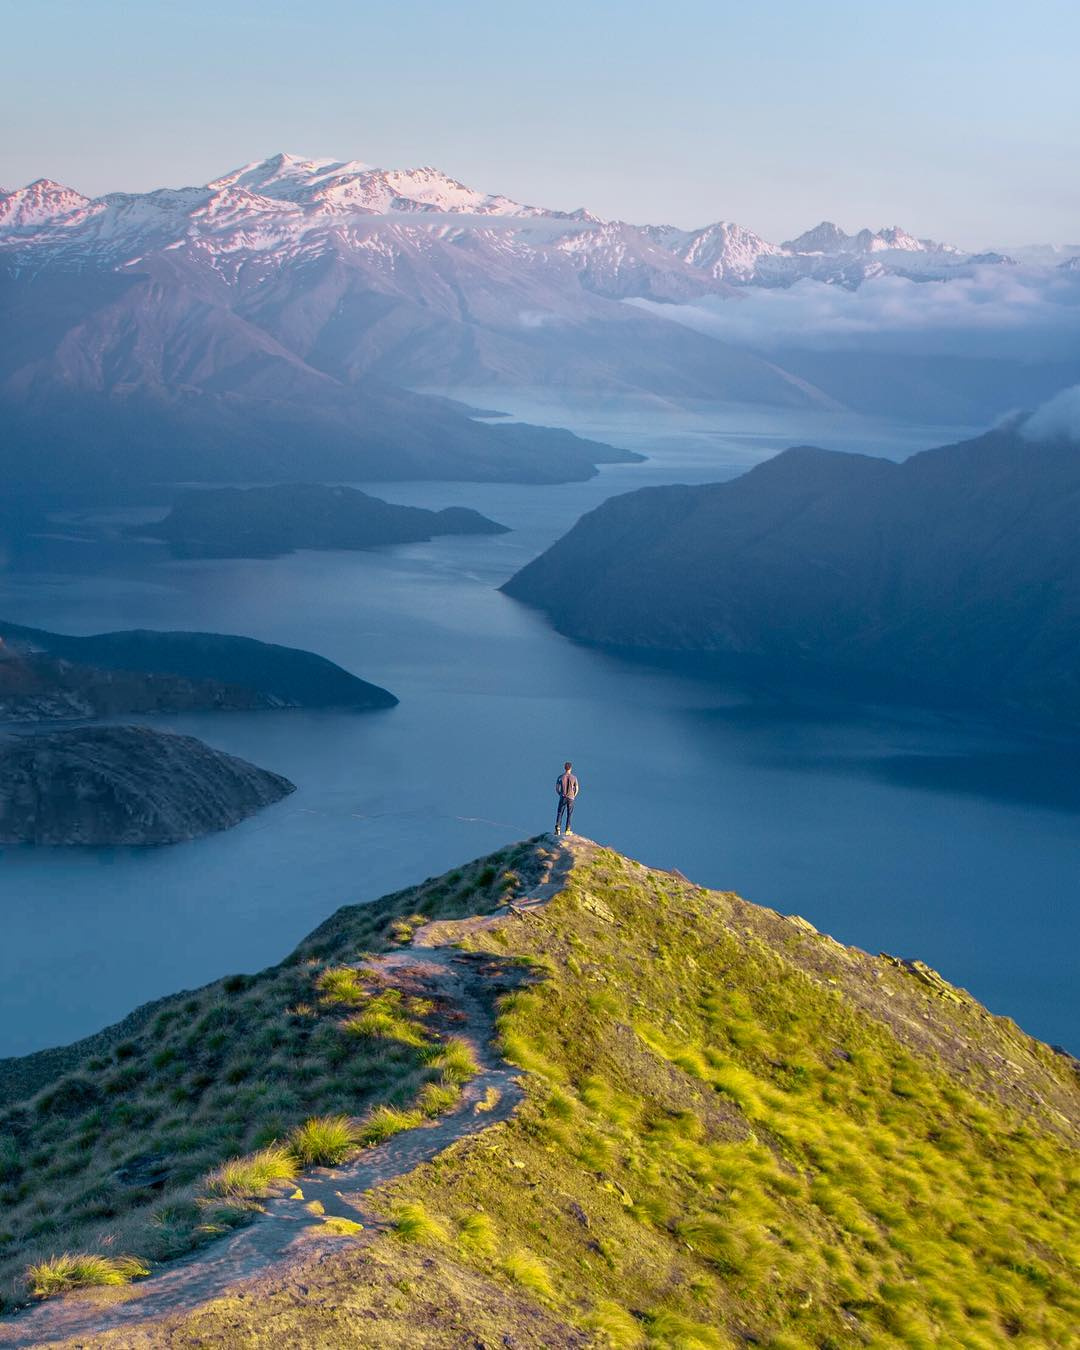 Путешествия и пейзажи от фотографа Сэма Вибово